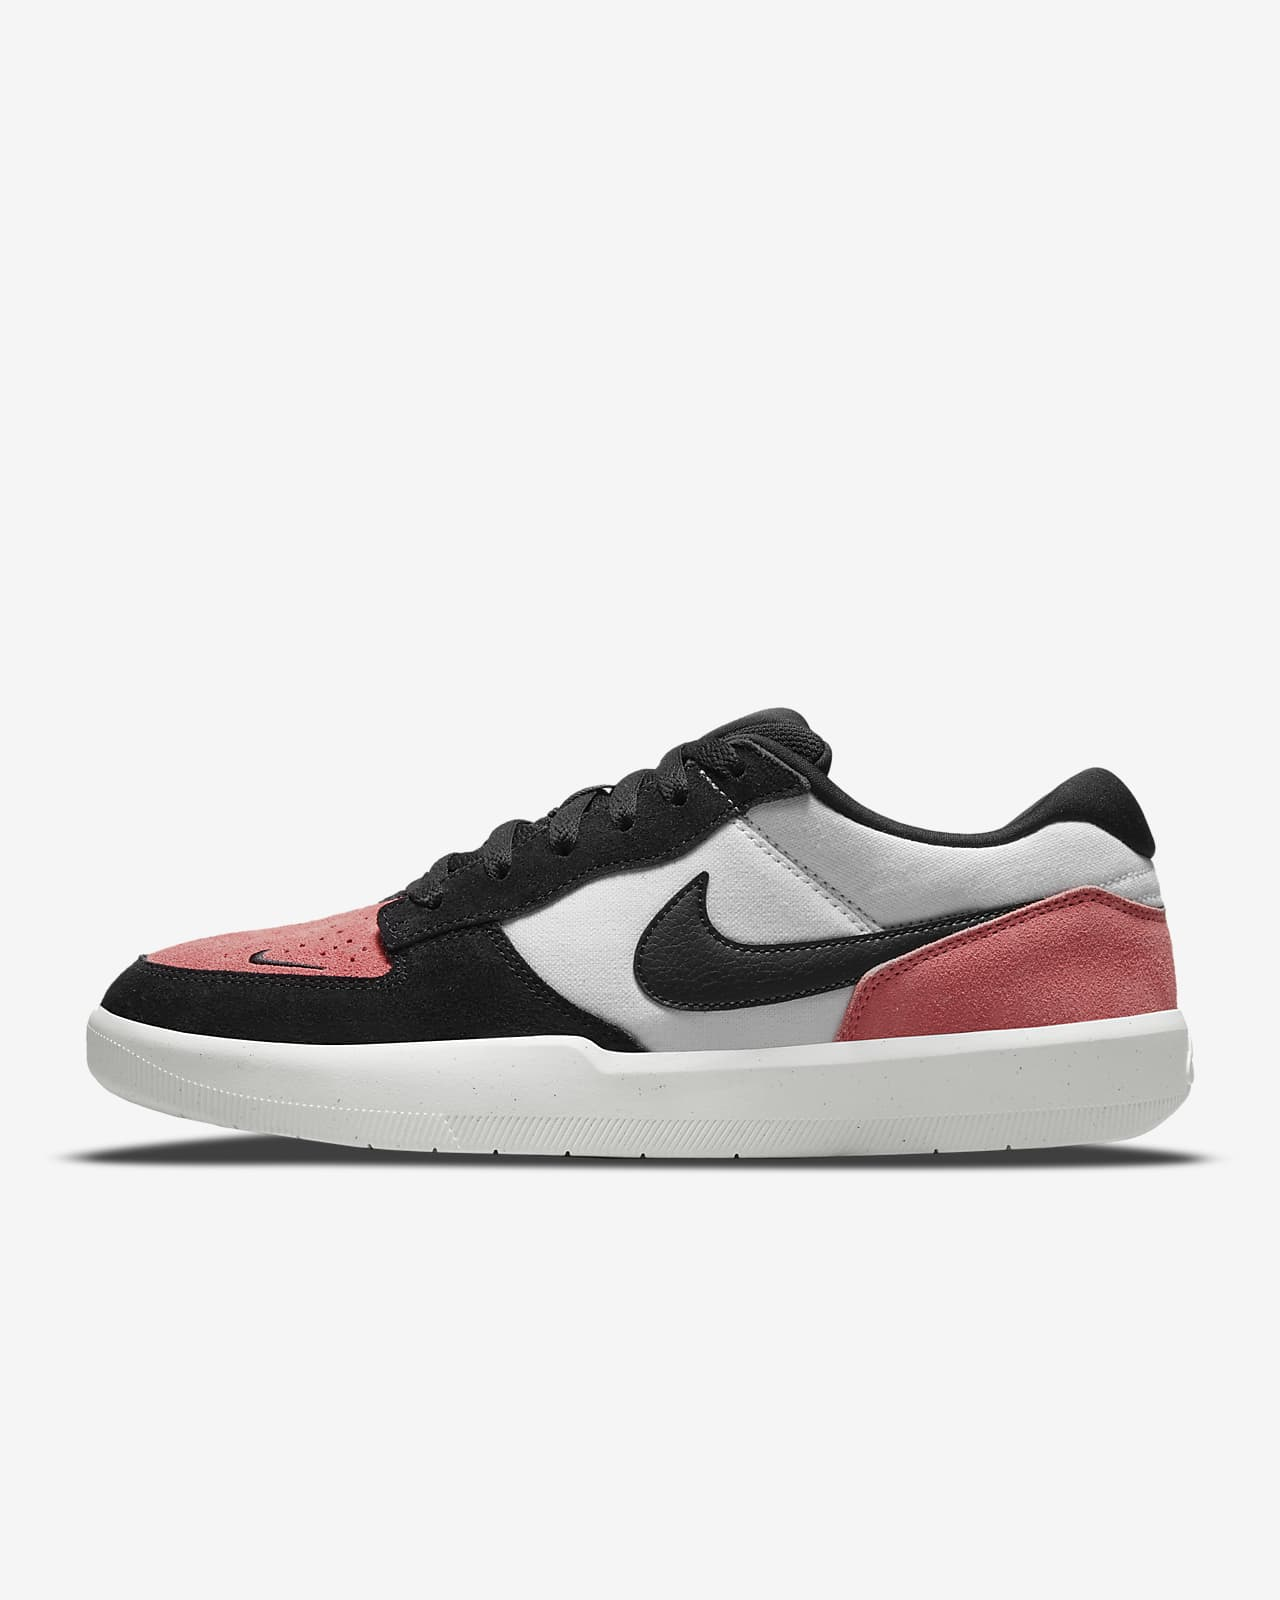 Chaussure de skateboard Nike SB Force 58. Nike LU